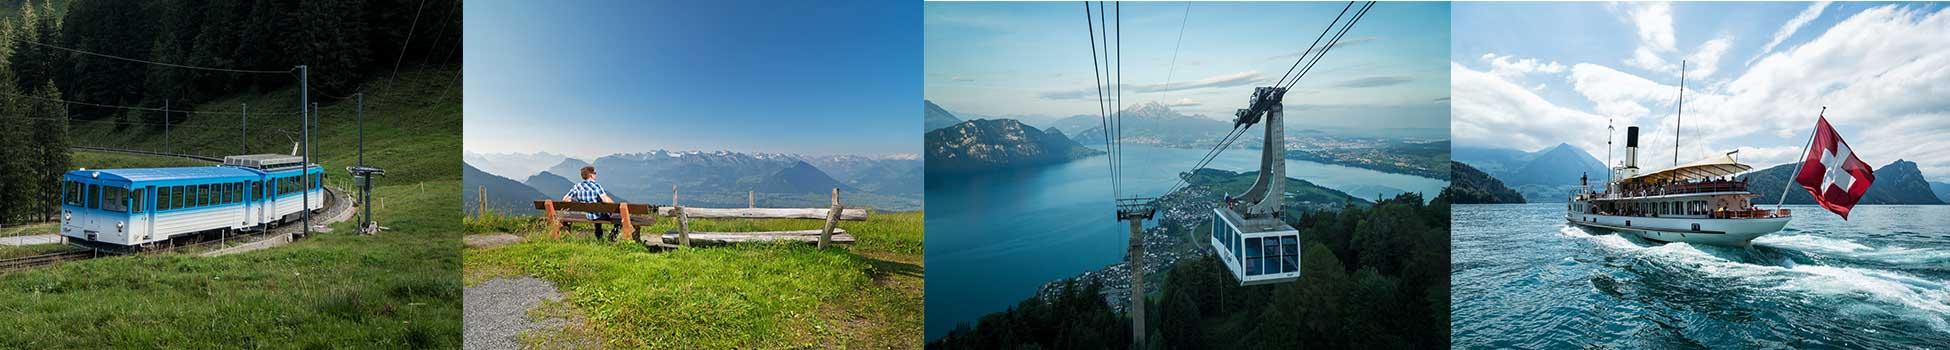 gleisnost-Tagesausflug-Schweiz-Rigi